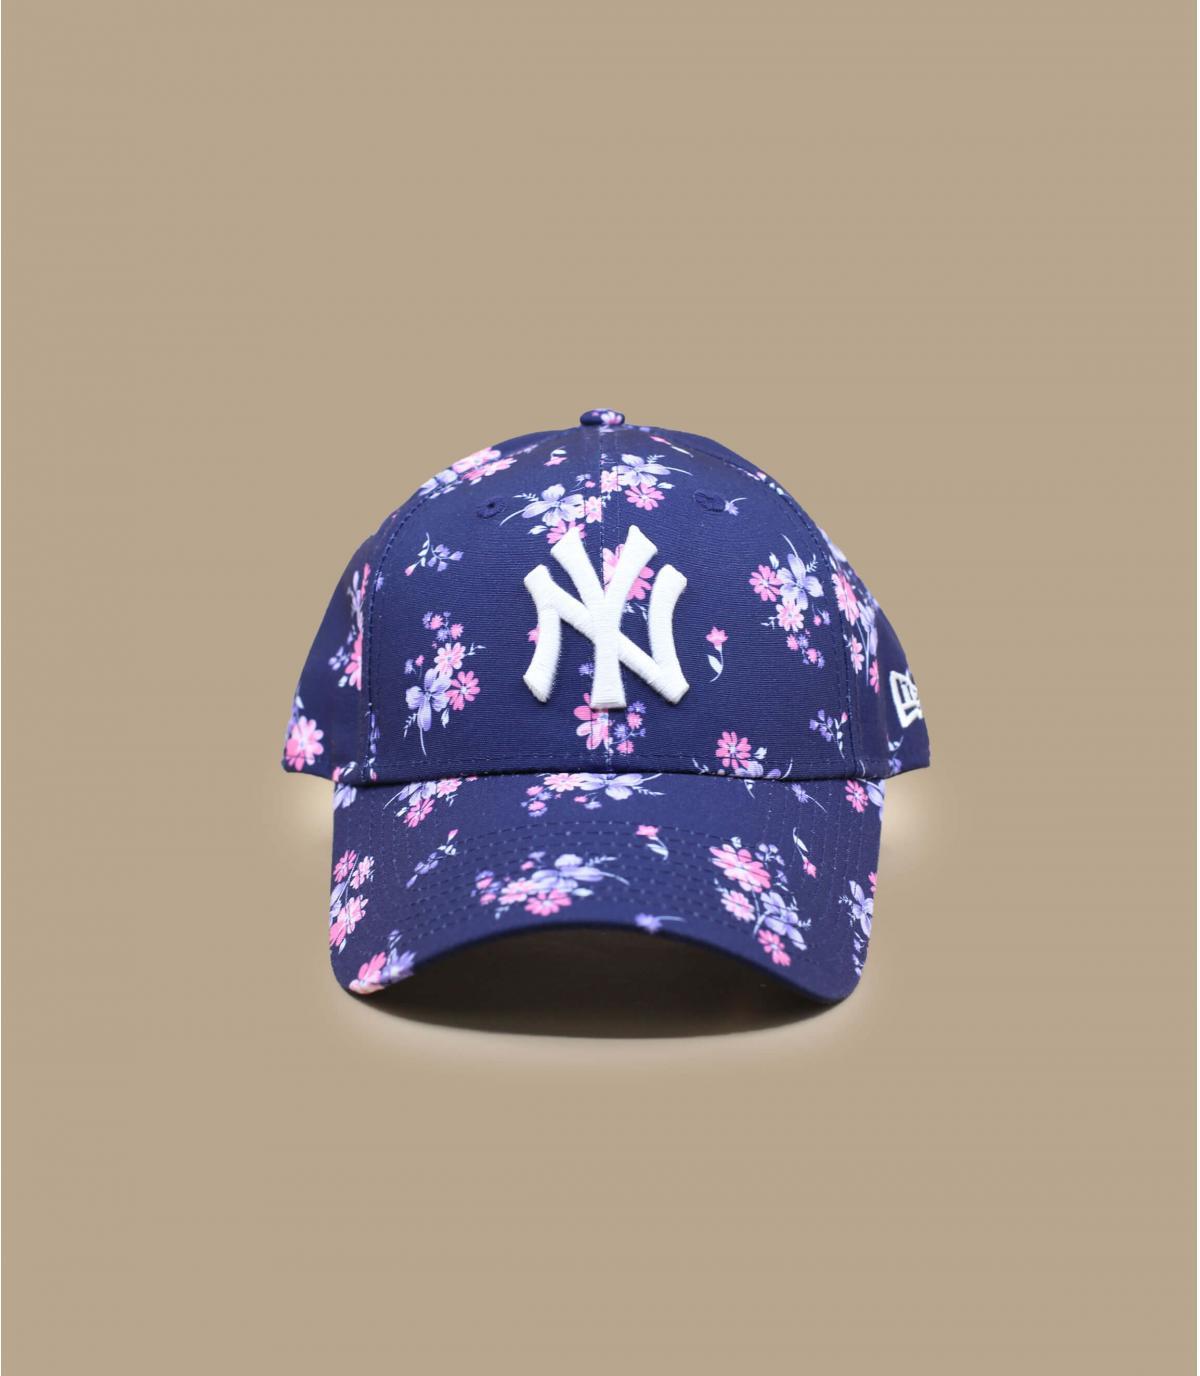 casquette NY femme fleurs